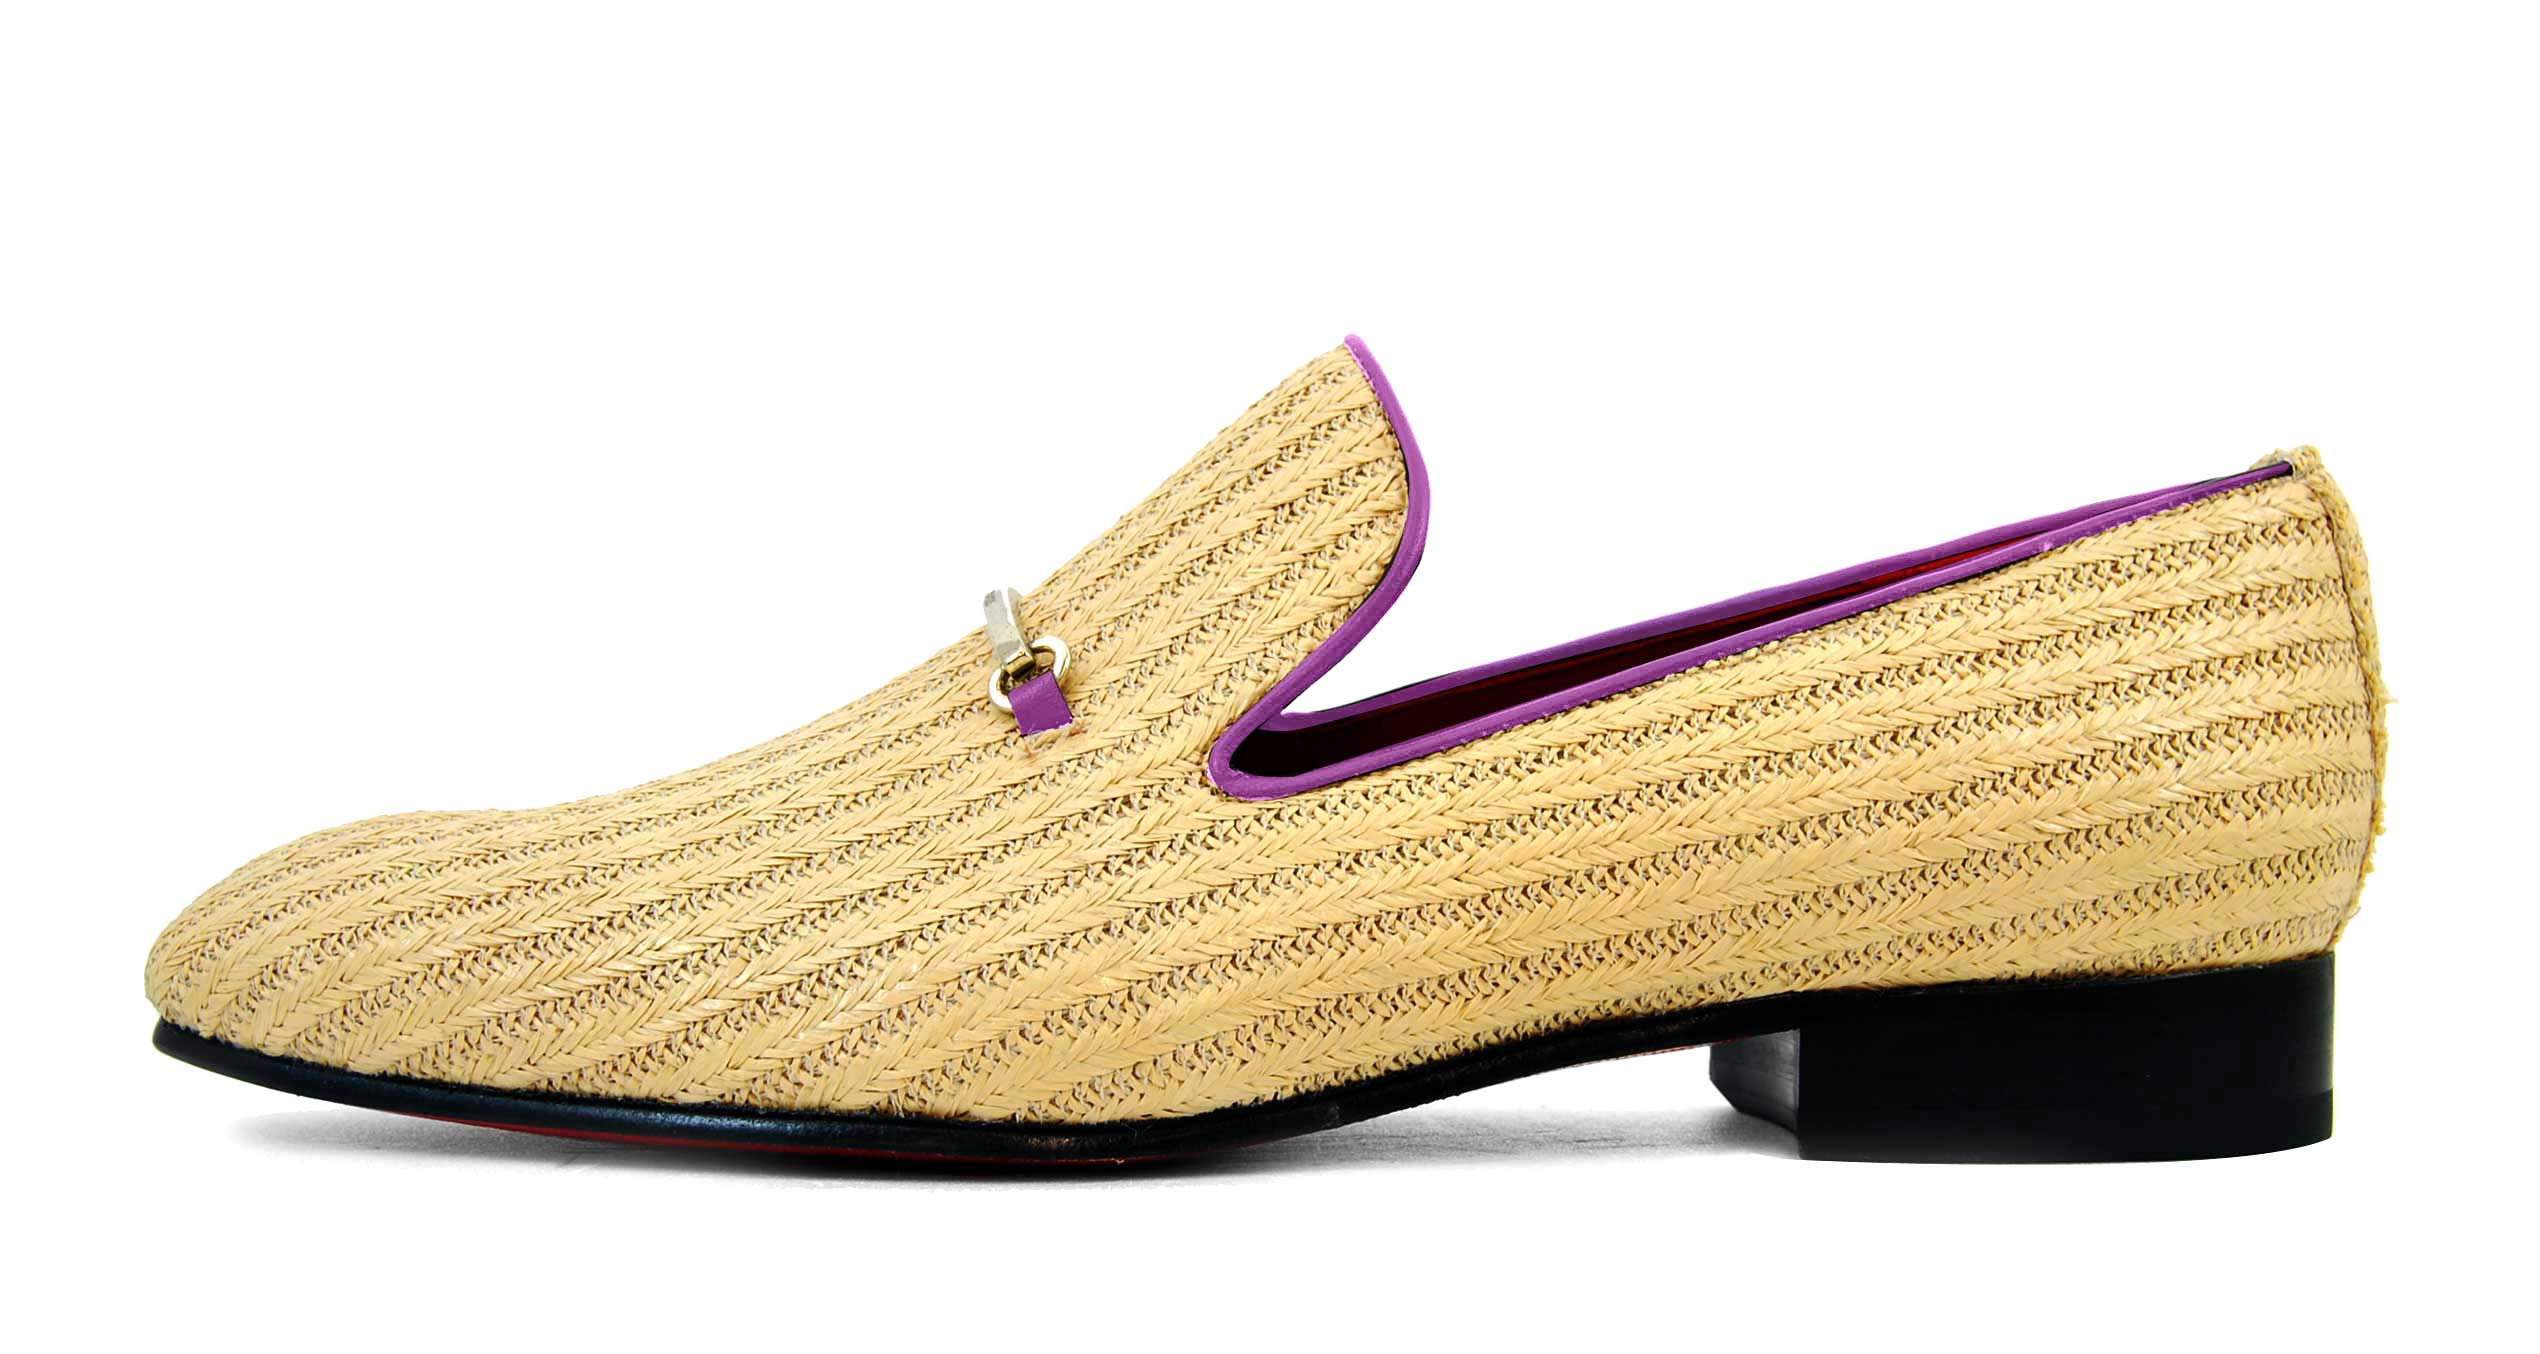 Foto 1 de Zapatos Palma Panameña Con Ribete Morado